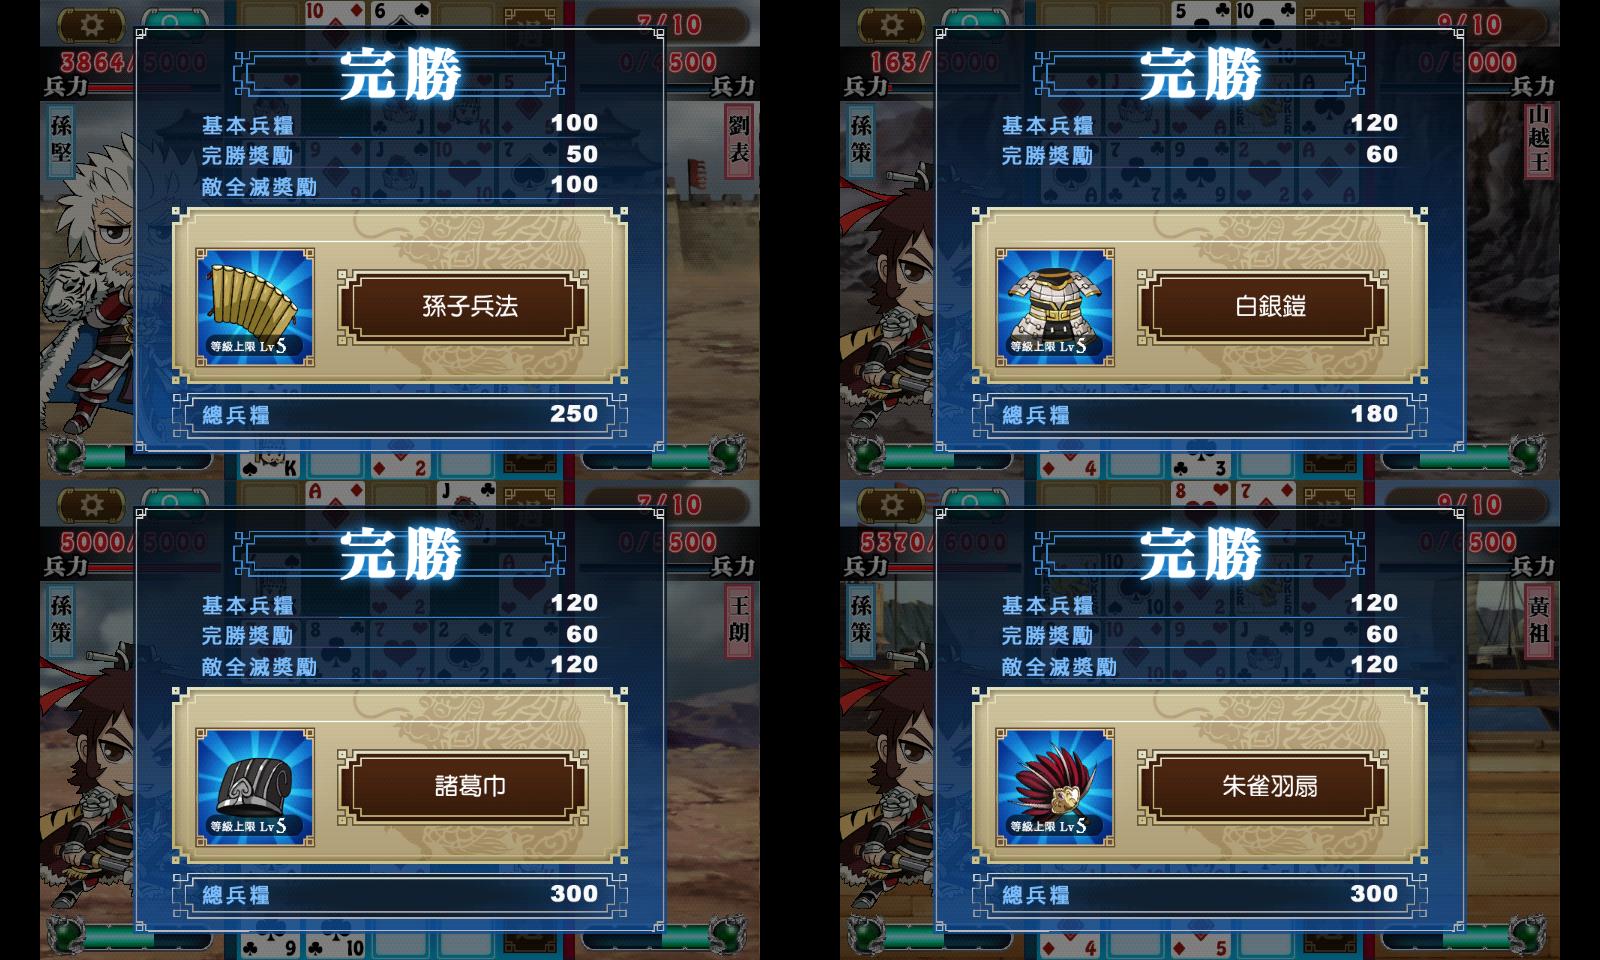 MoaiCity: 智將三國 - 用牌技奪江山